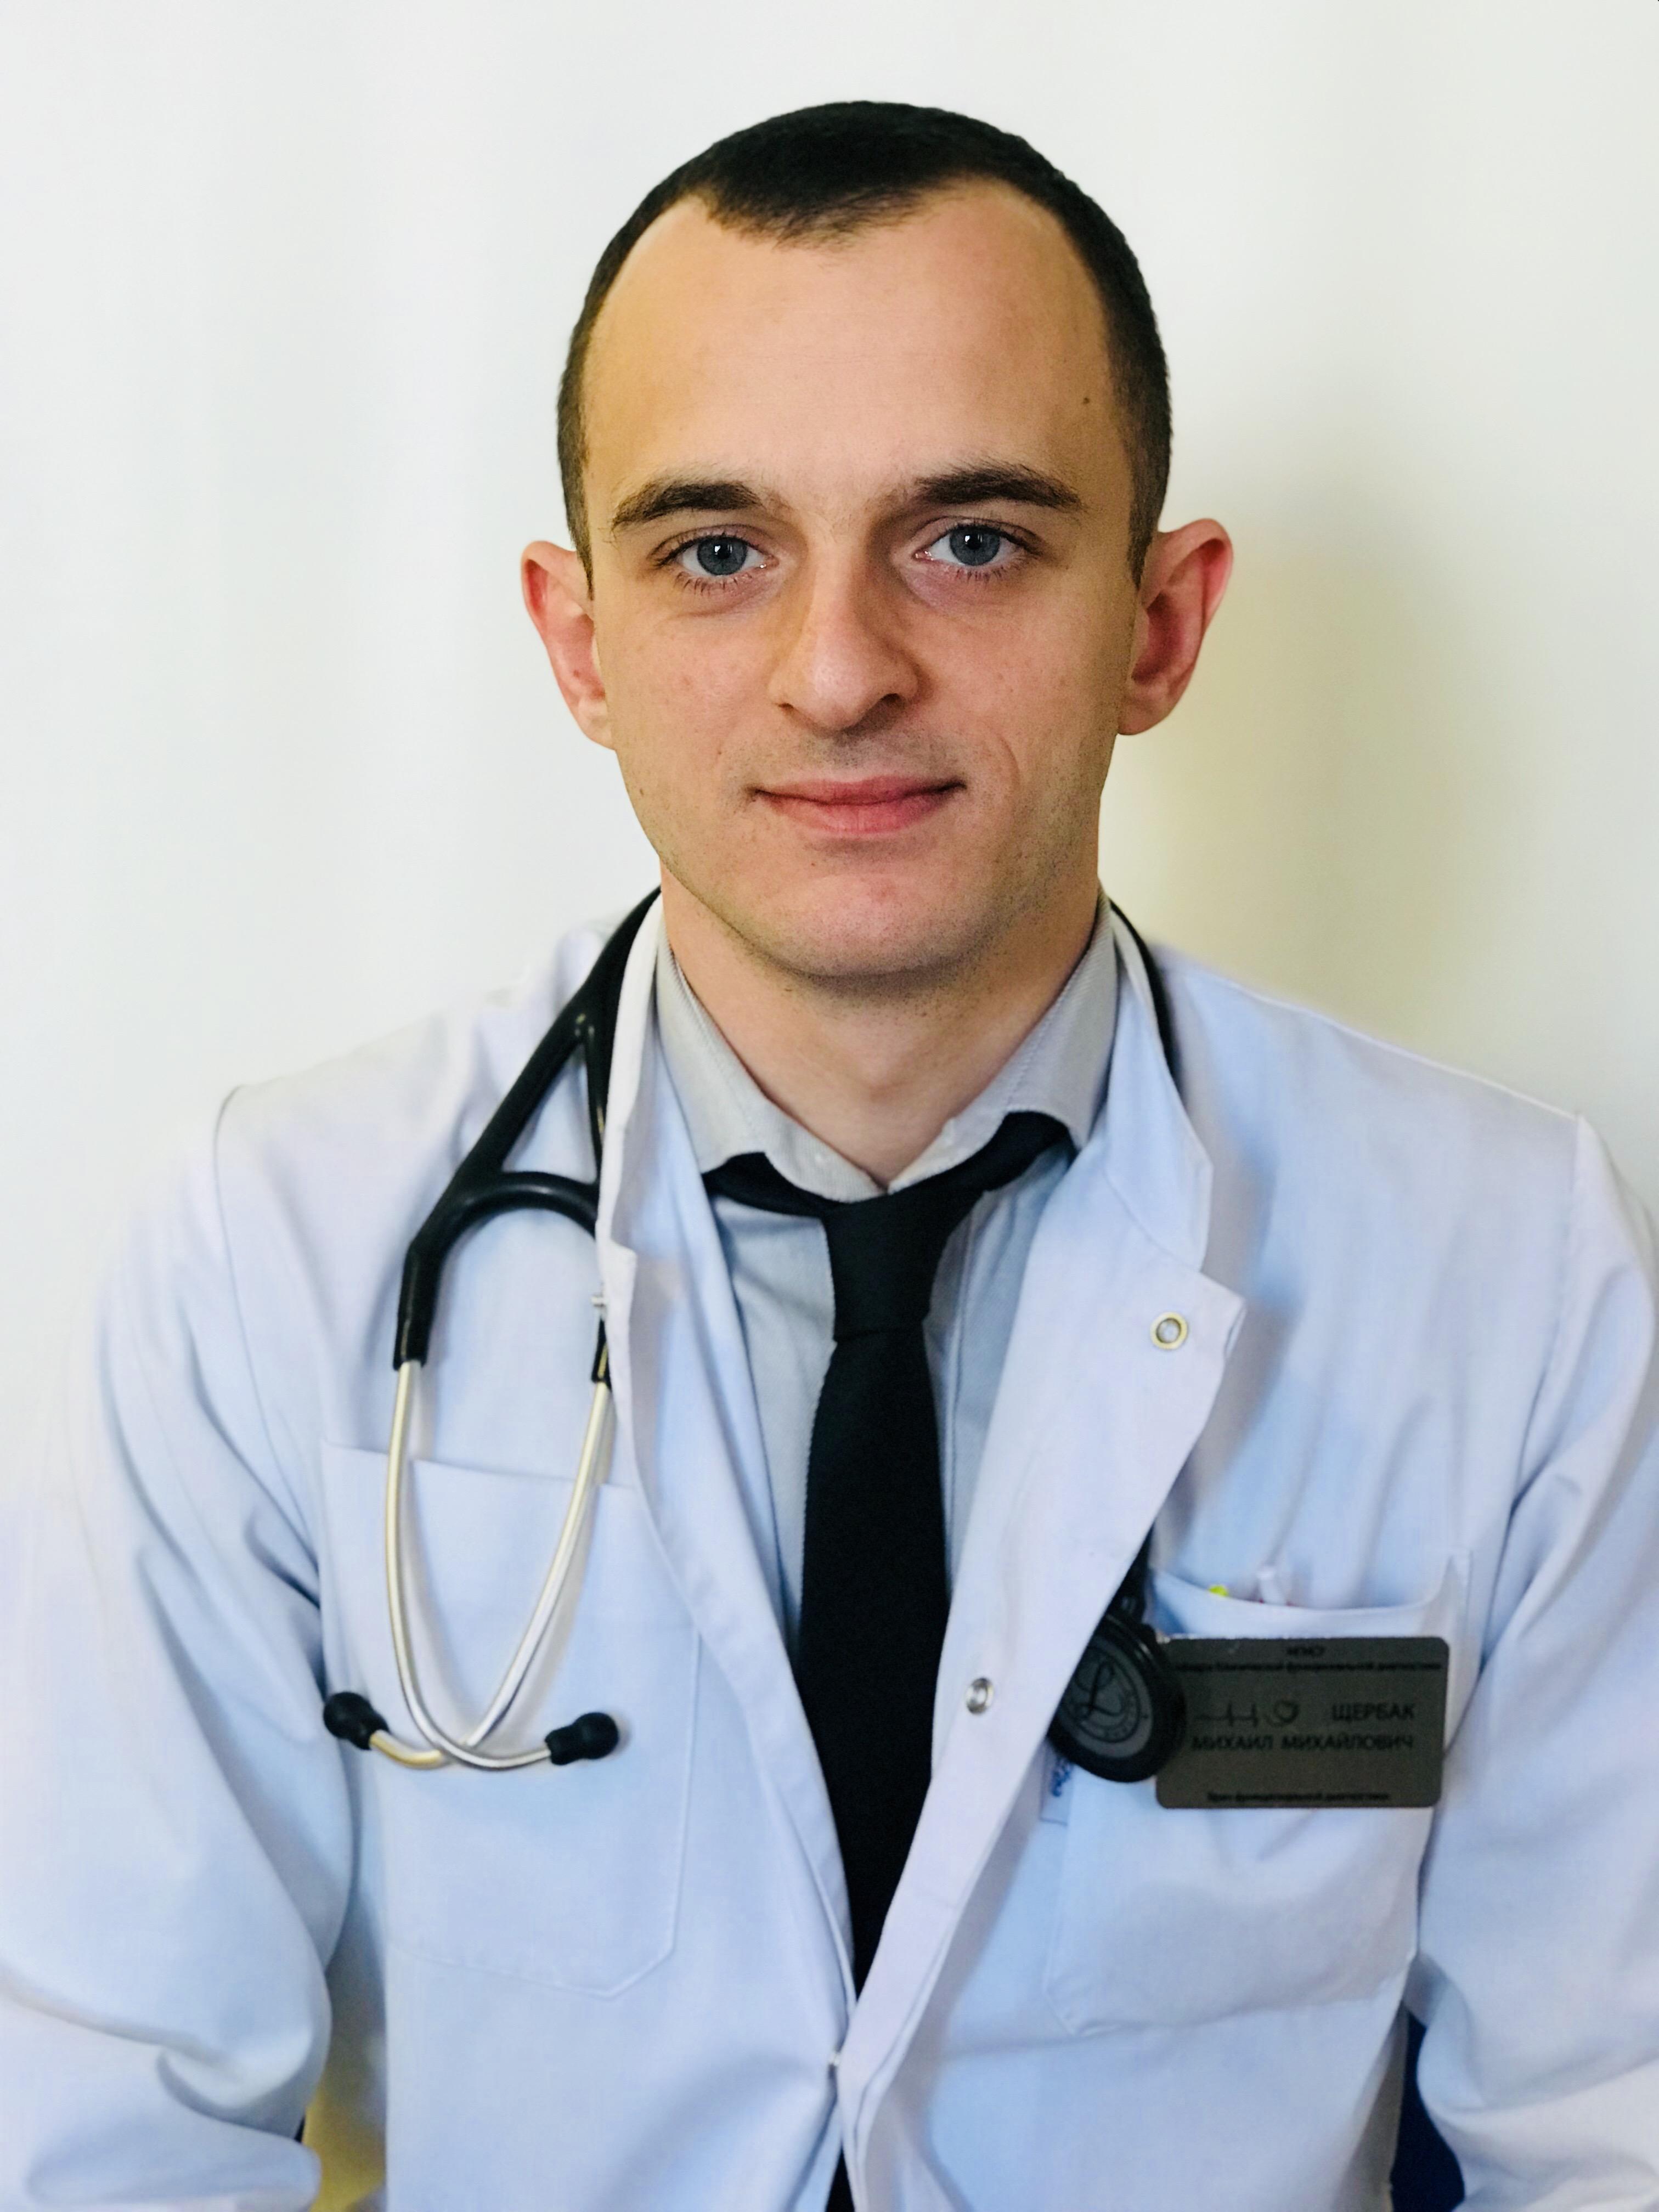 Д-р Михаил Шчербак